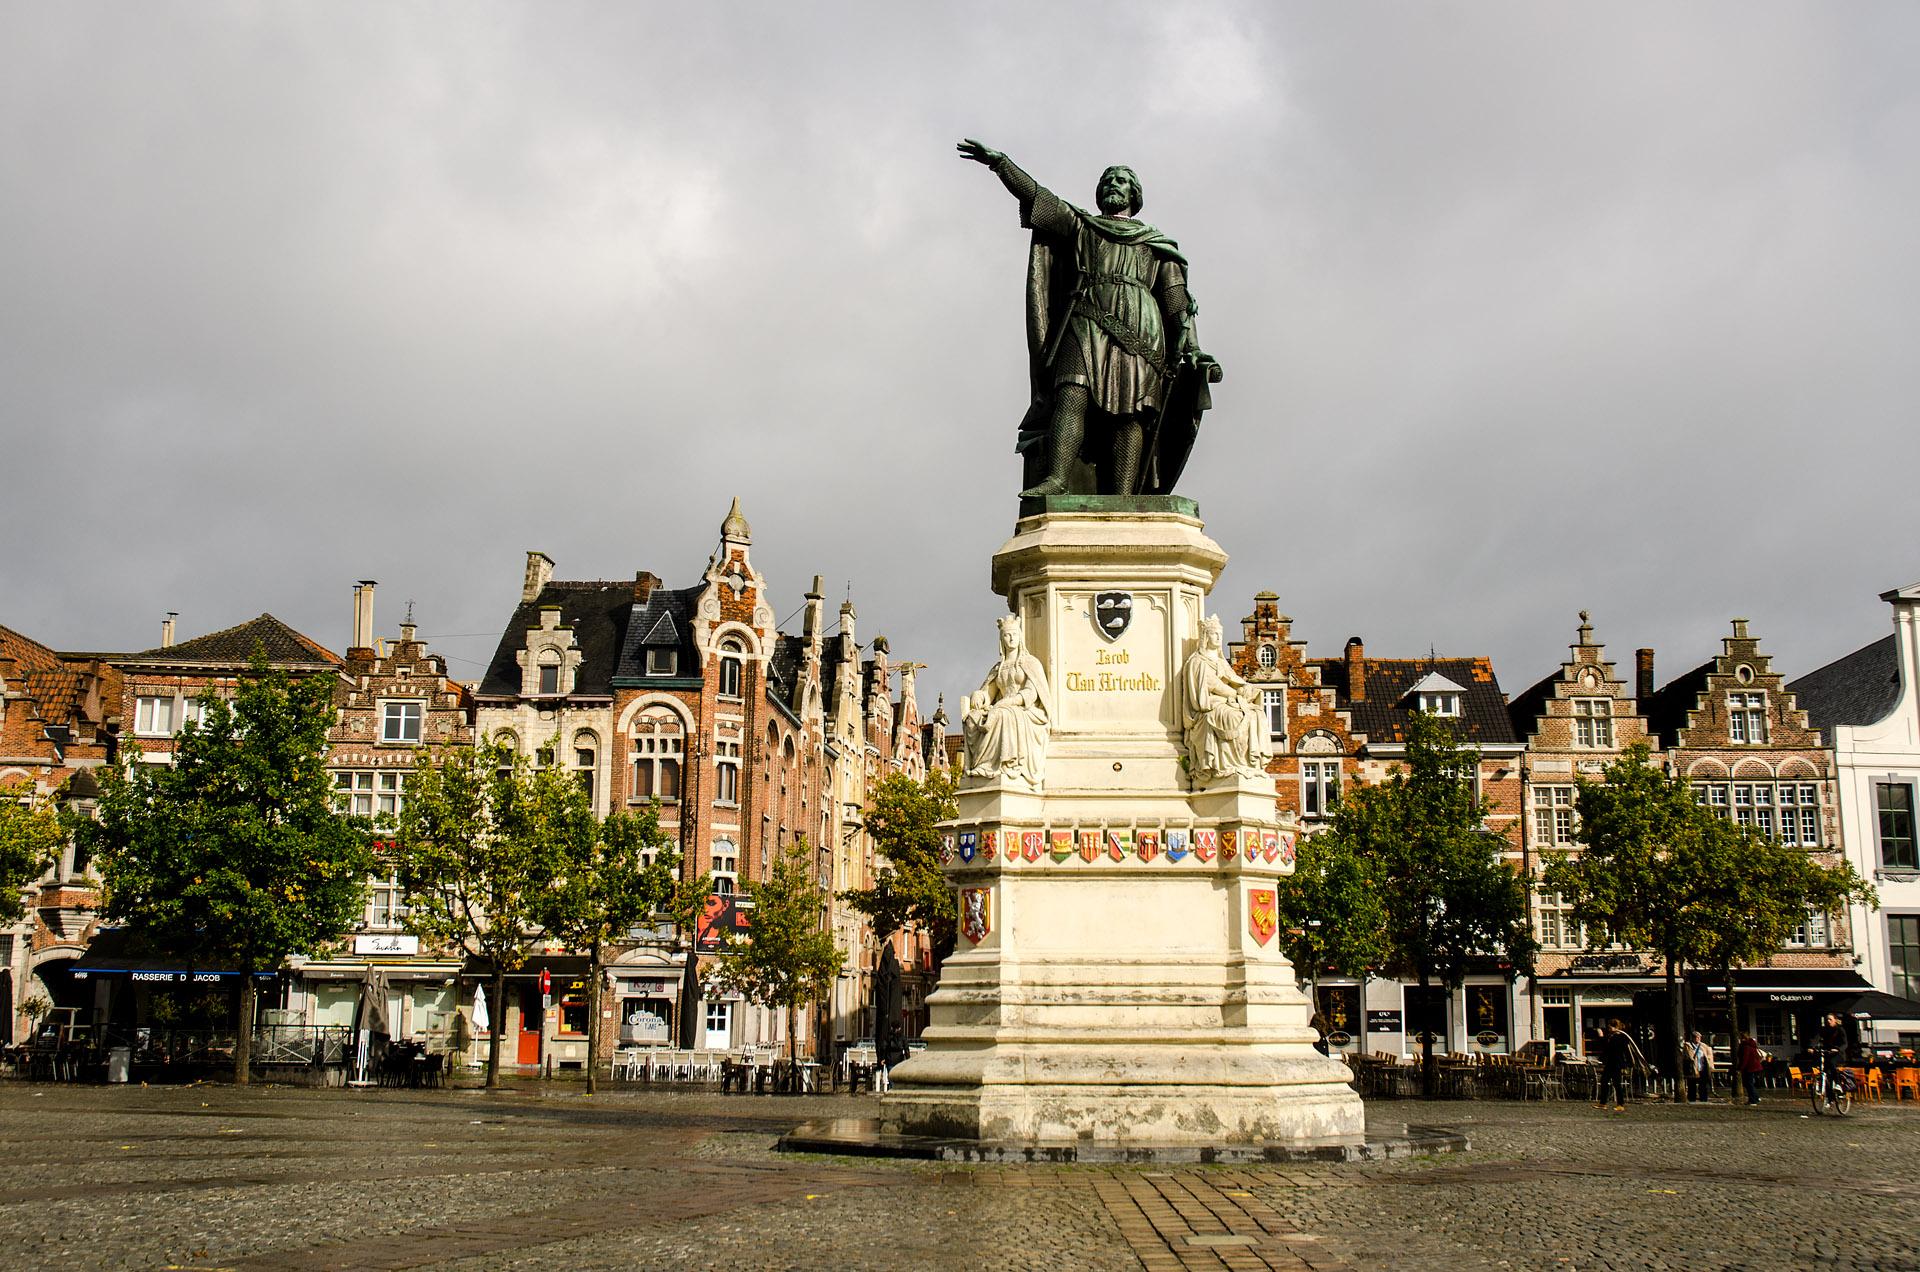 Jacob van Artevelde (The Wise Man & Brewer of Ghent)